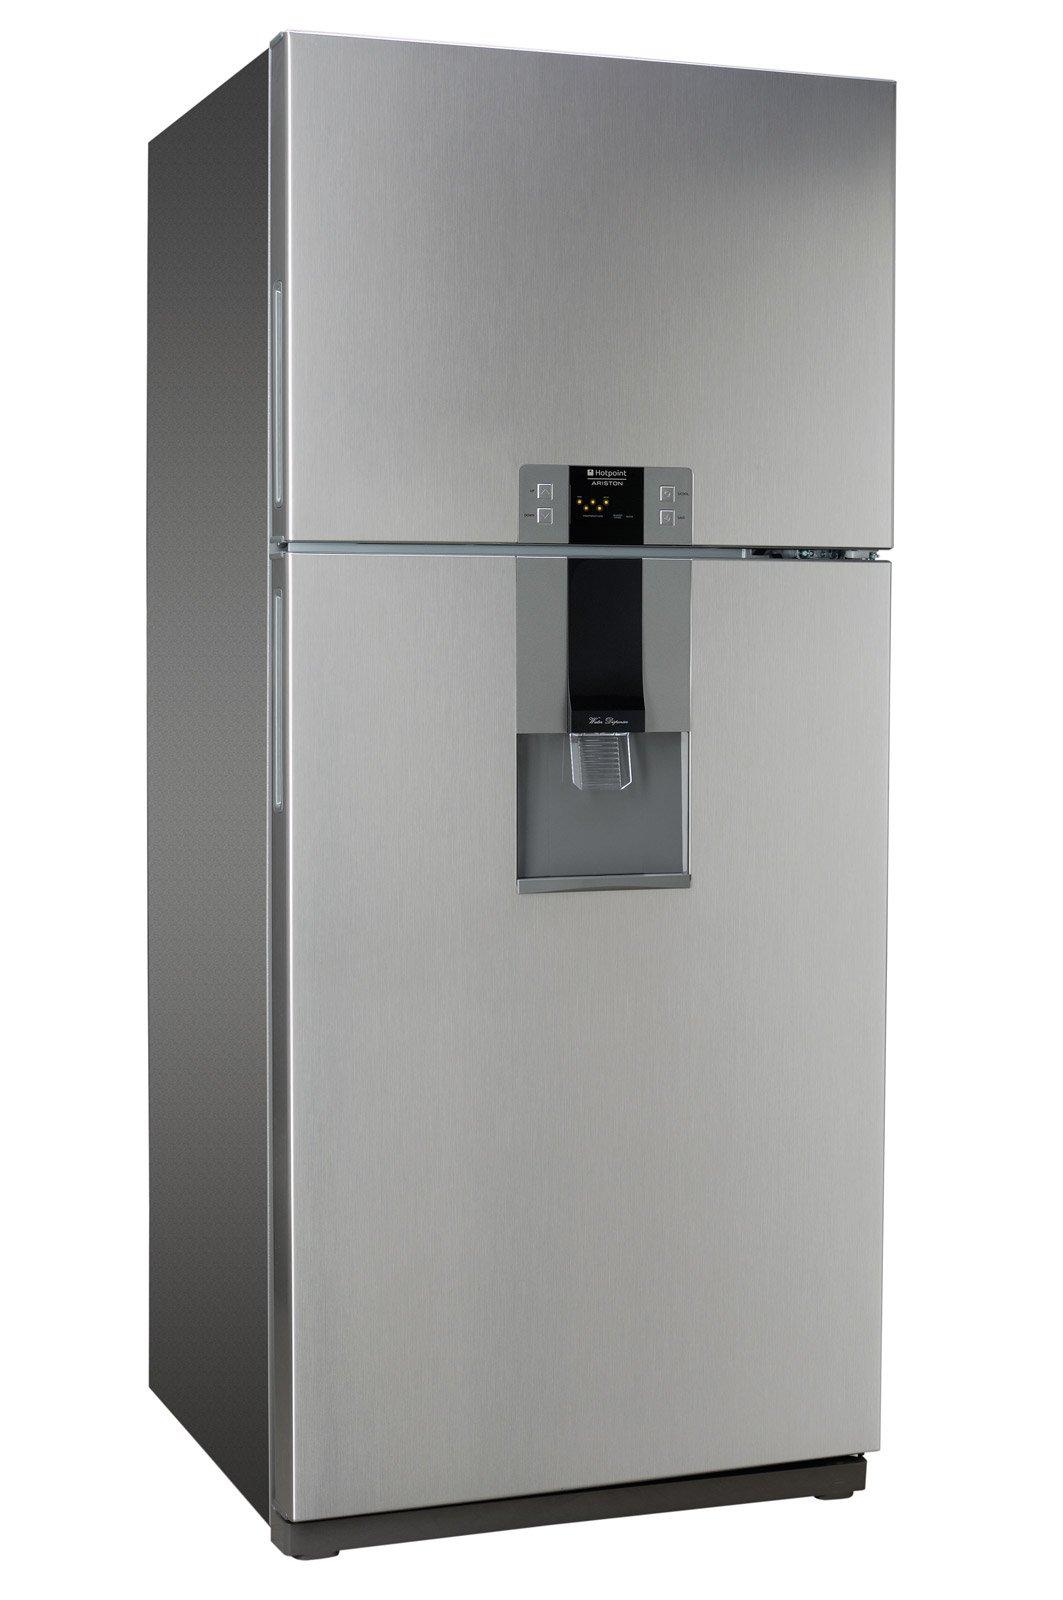 Best frigoriferi con dispenser pictures acrylicgiftware - Frigorifero doppia porta prezzi ...